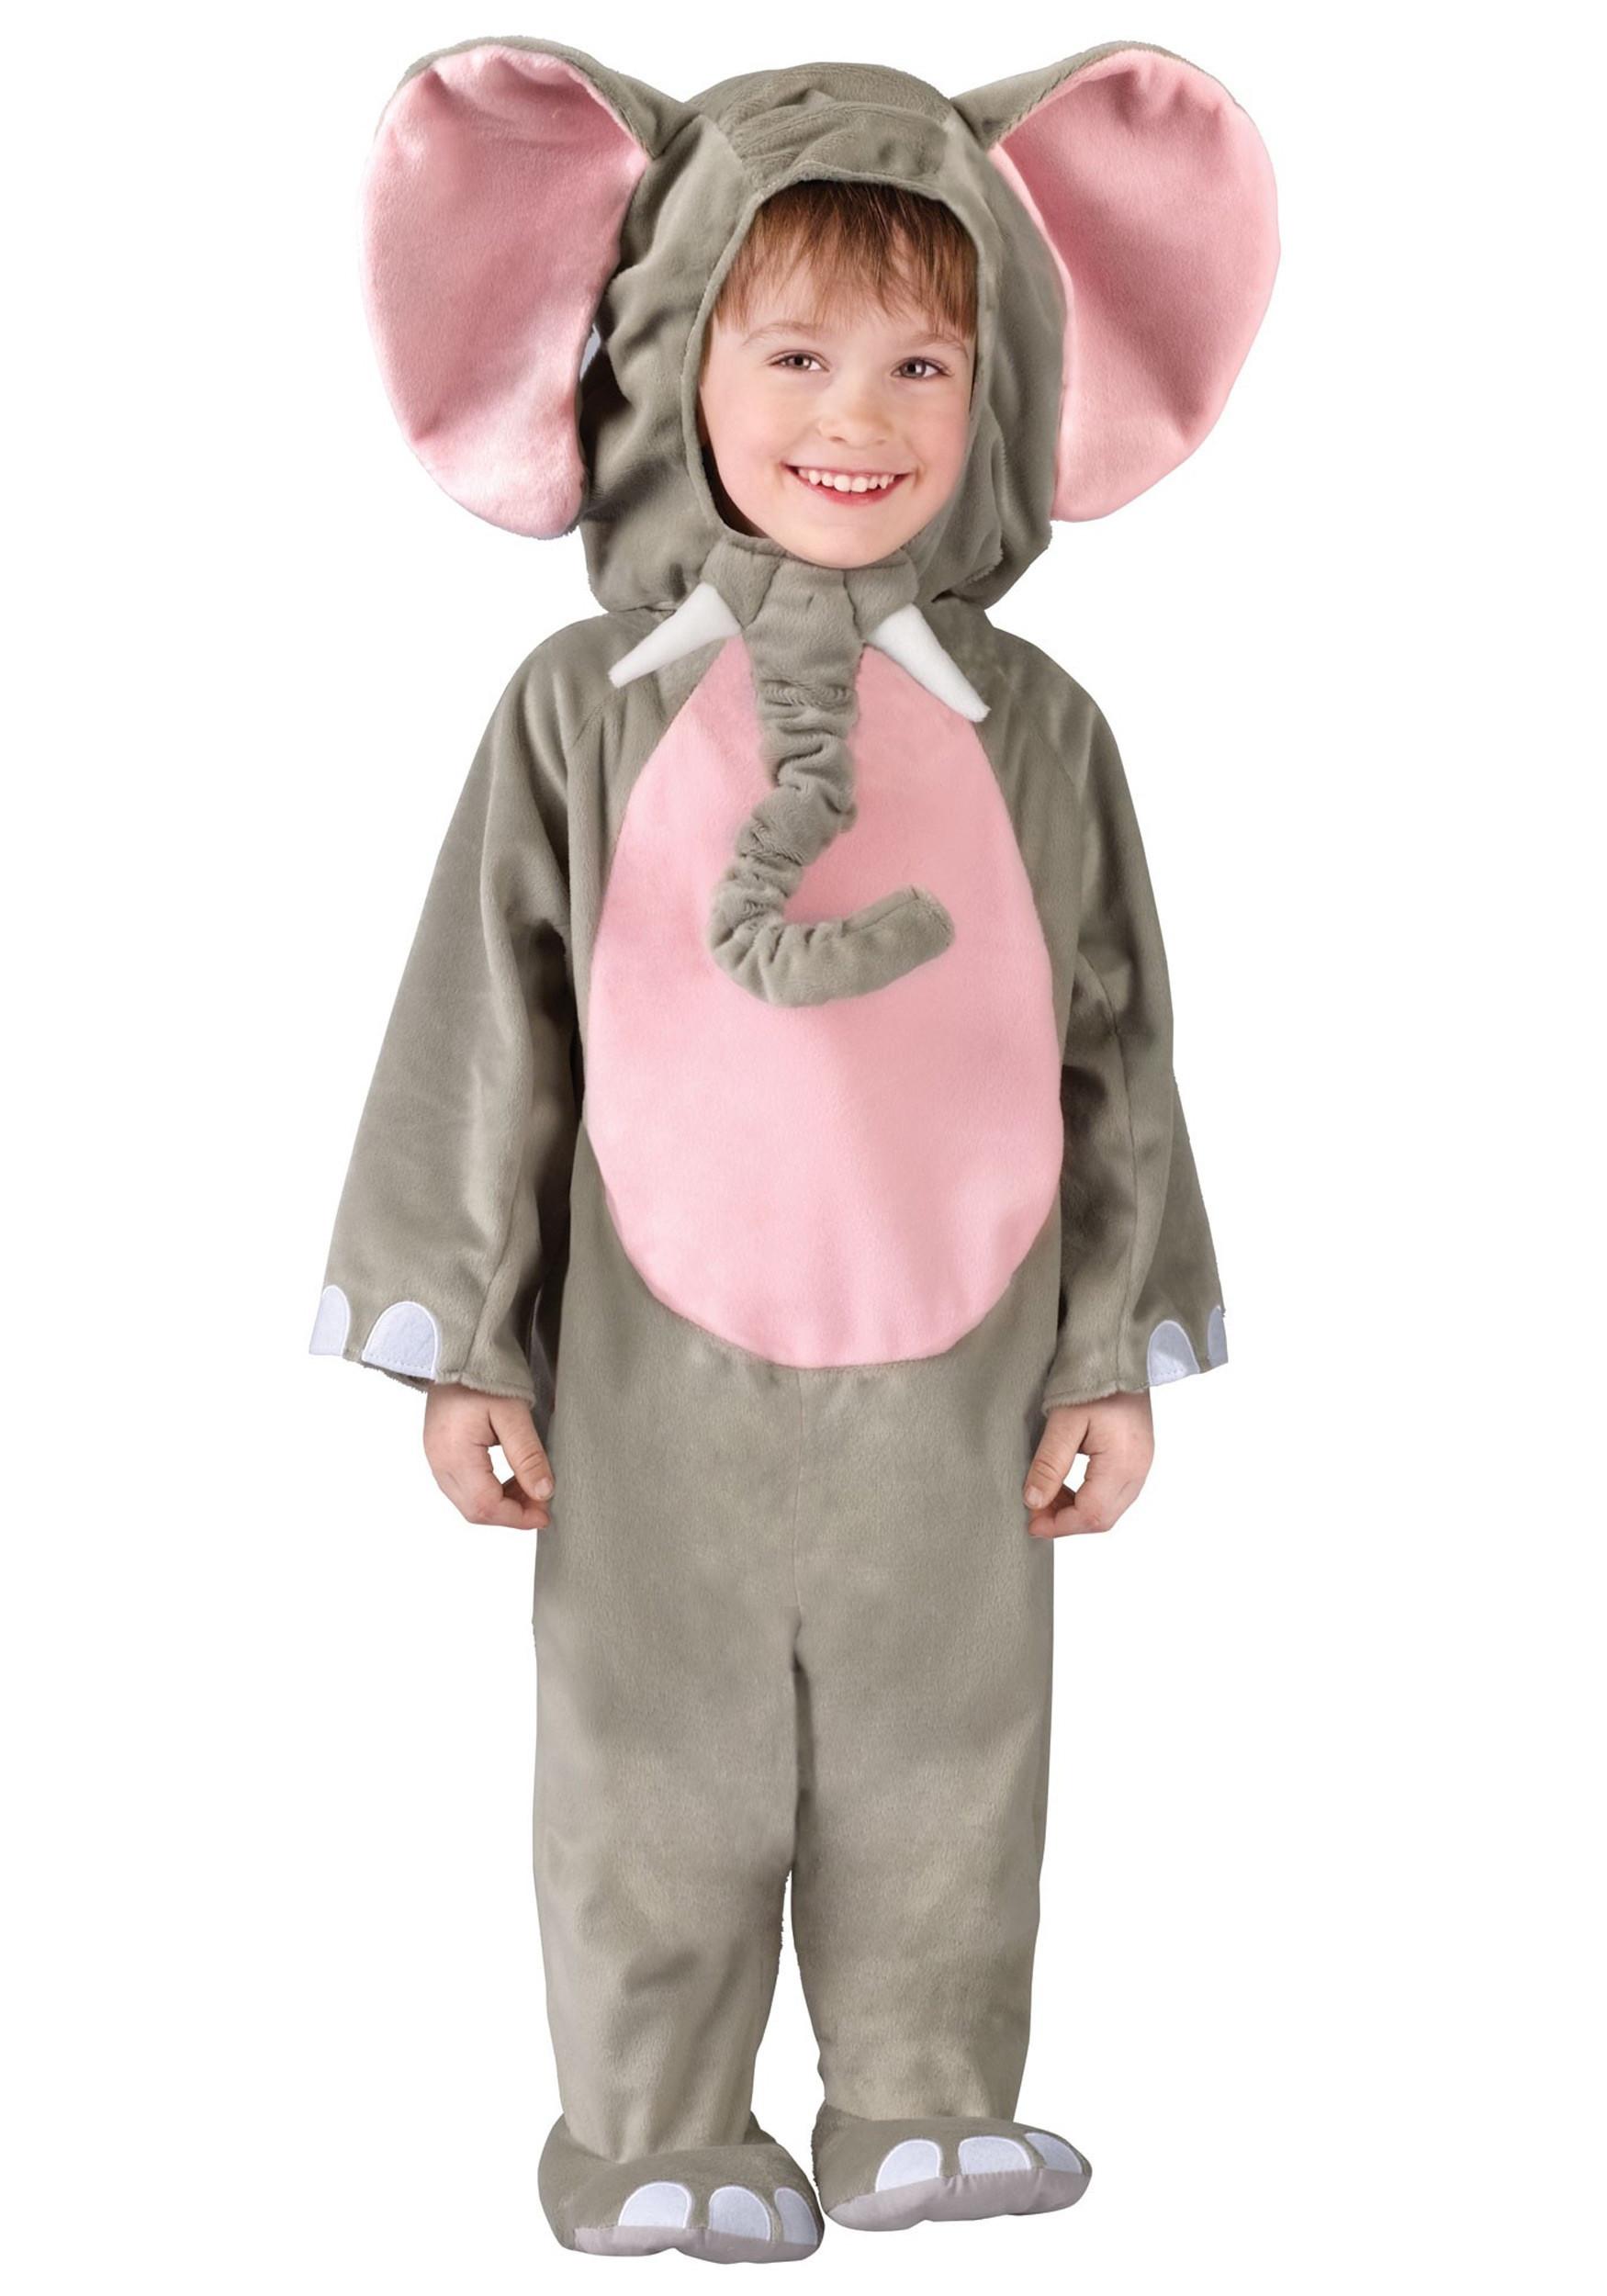 Toddler DIY Costumes  Toddler Elephant Costume